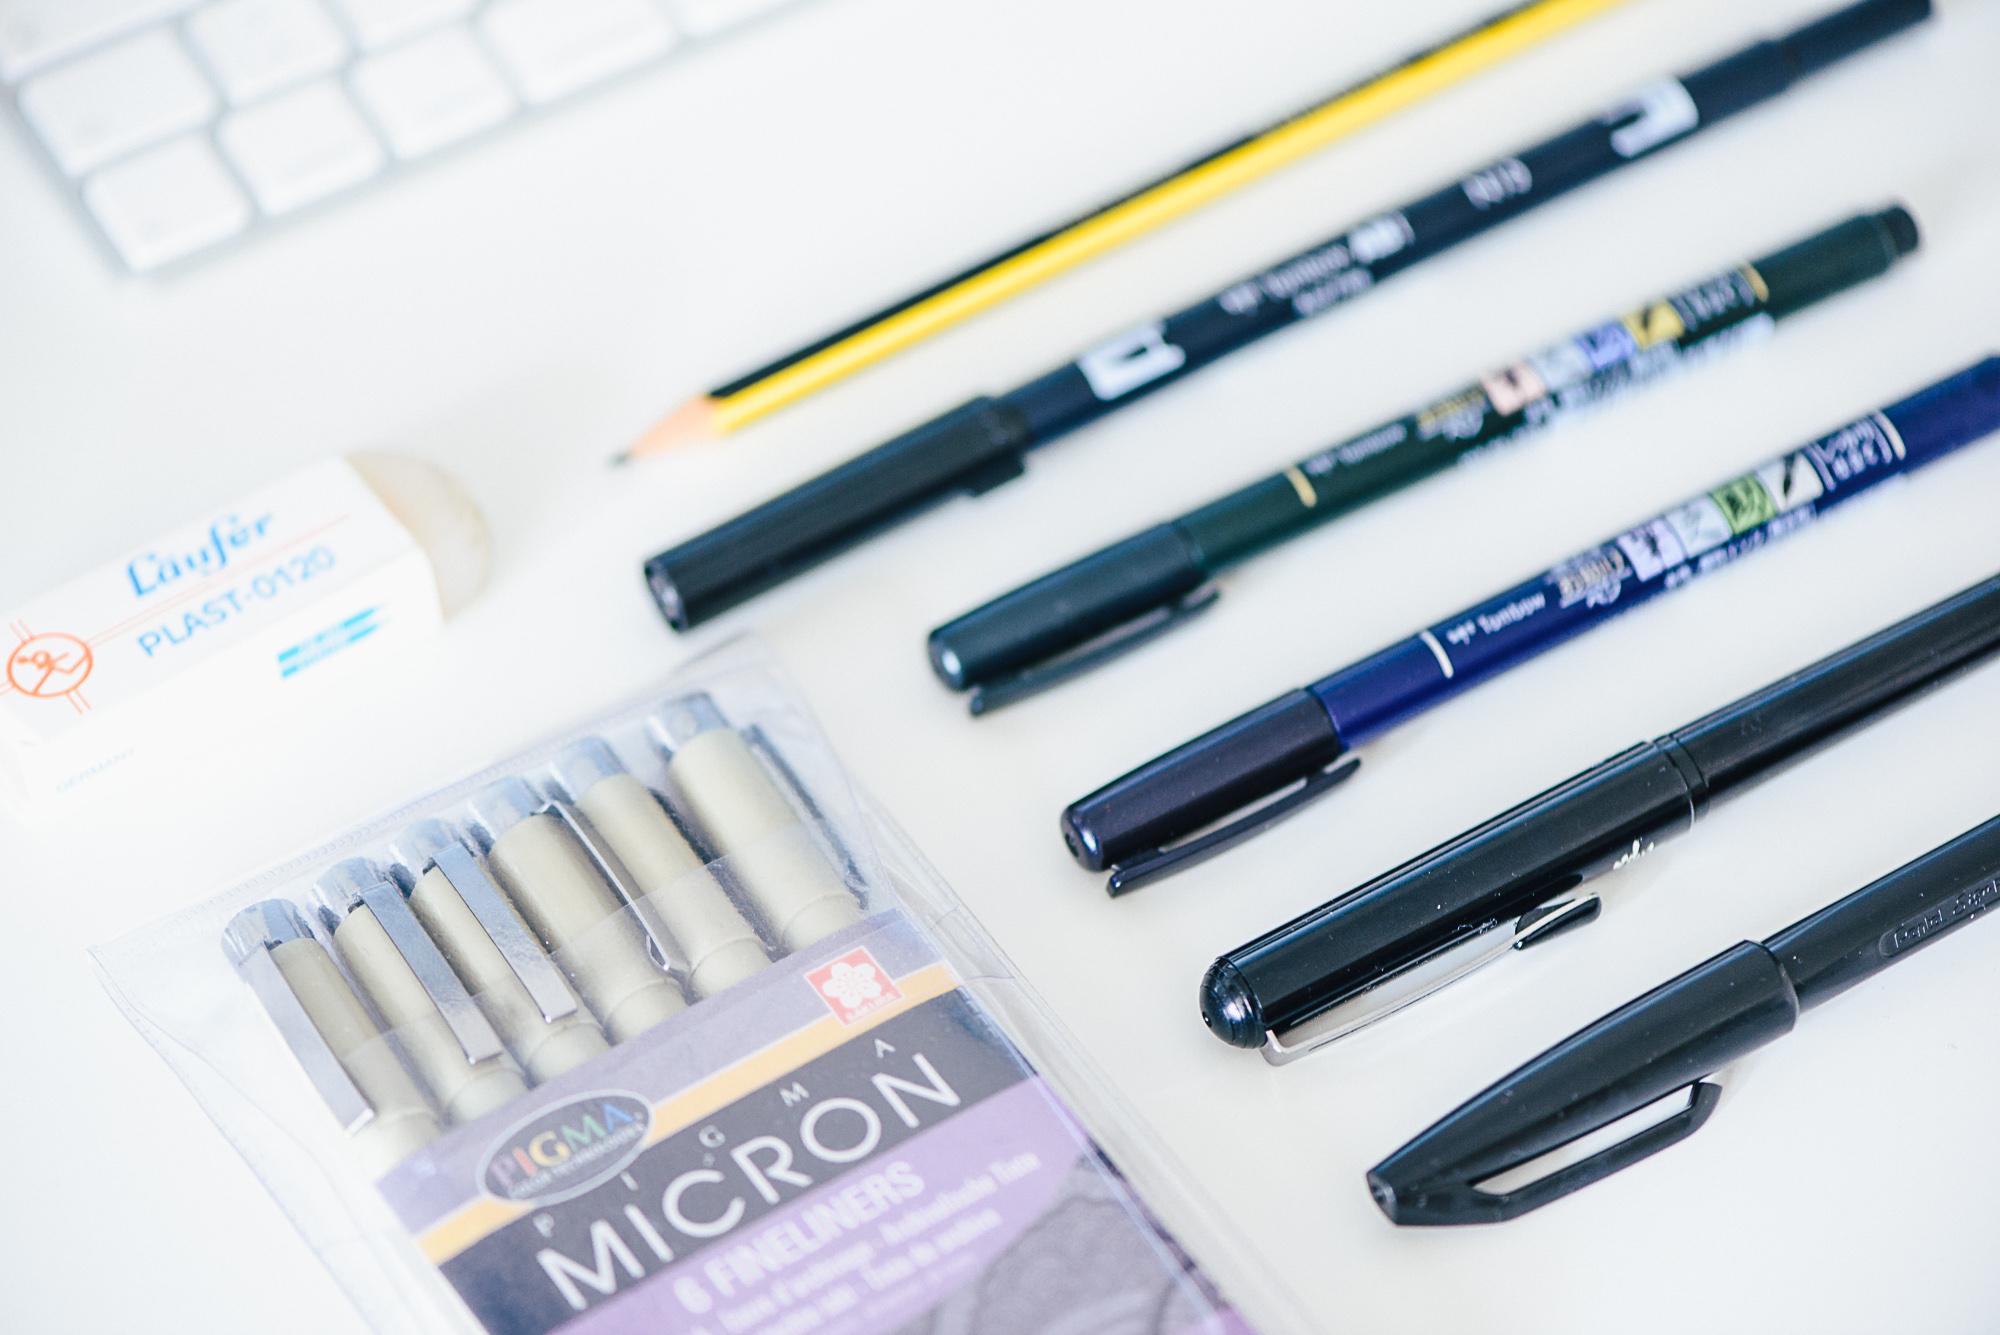 Lettering_lernen Stifte